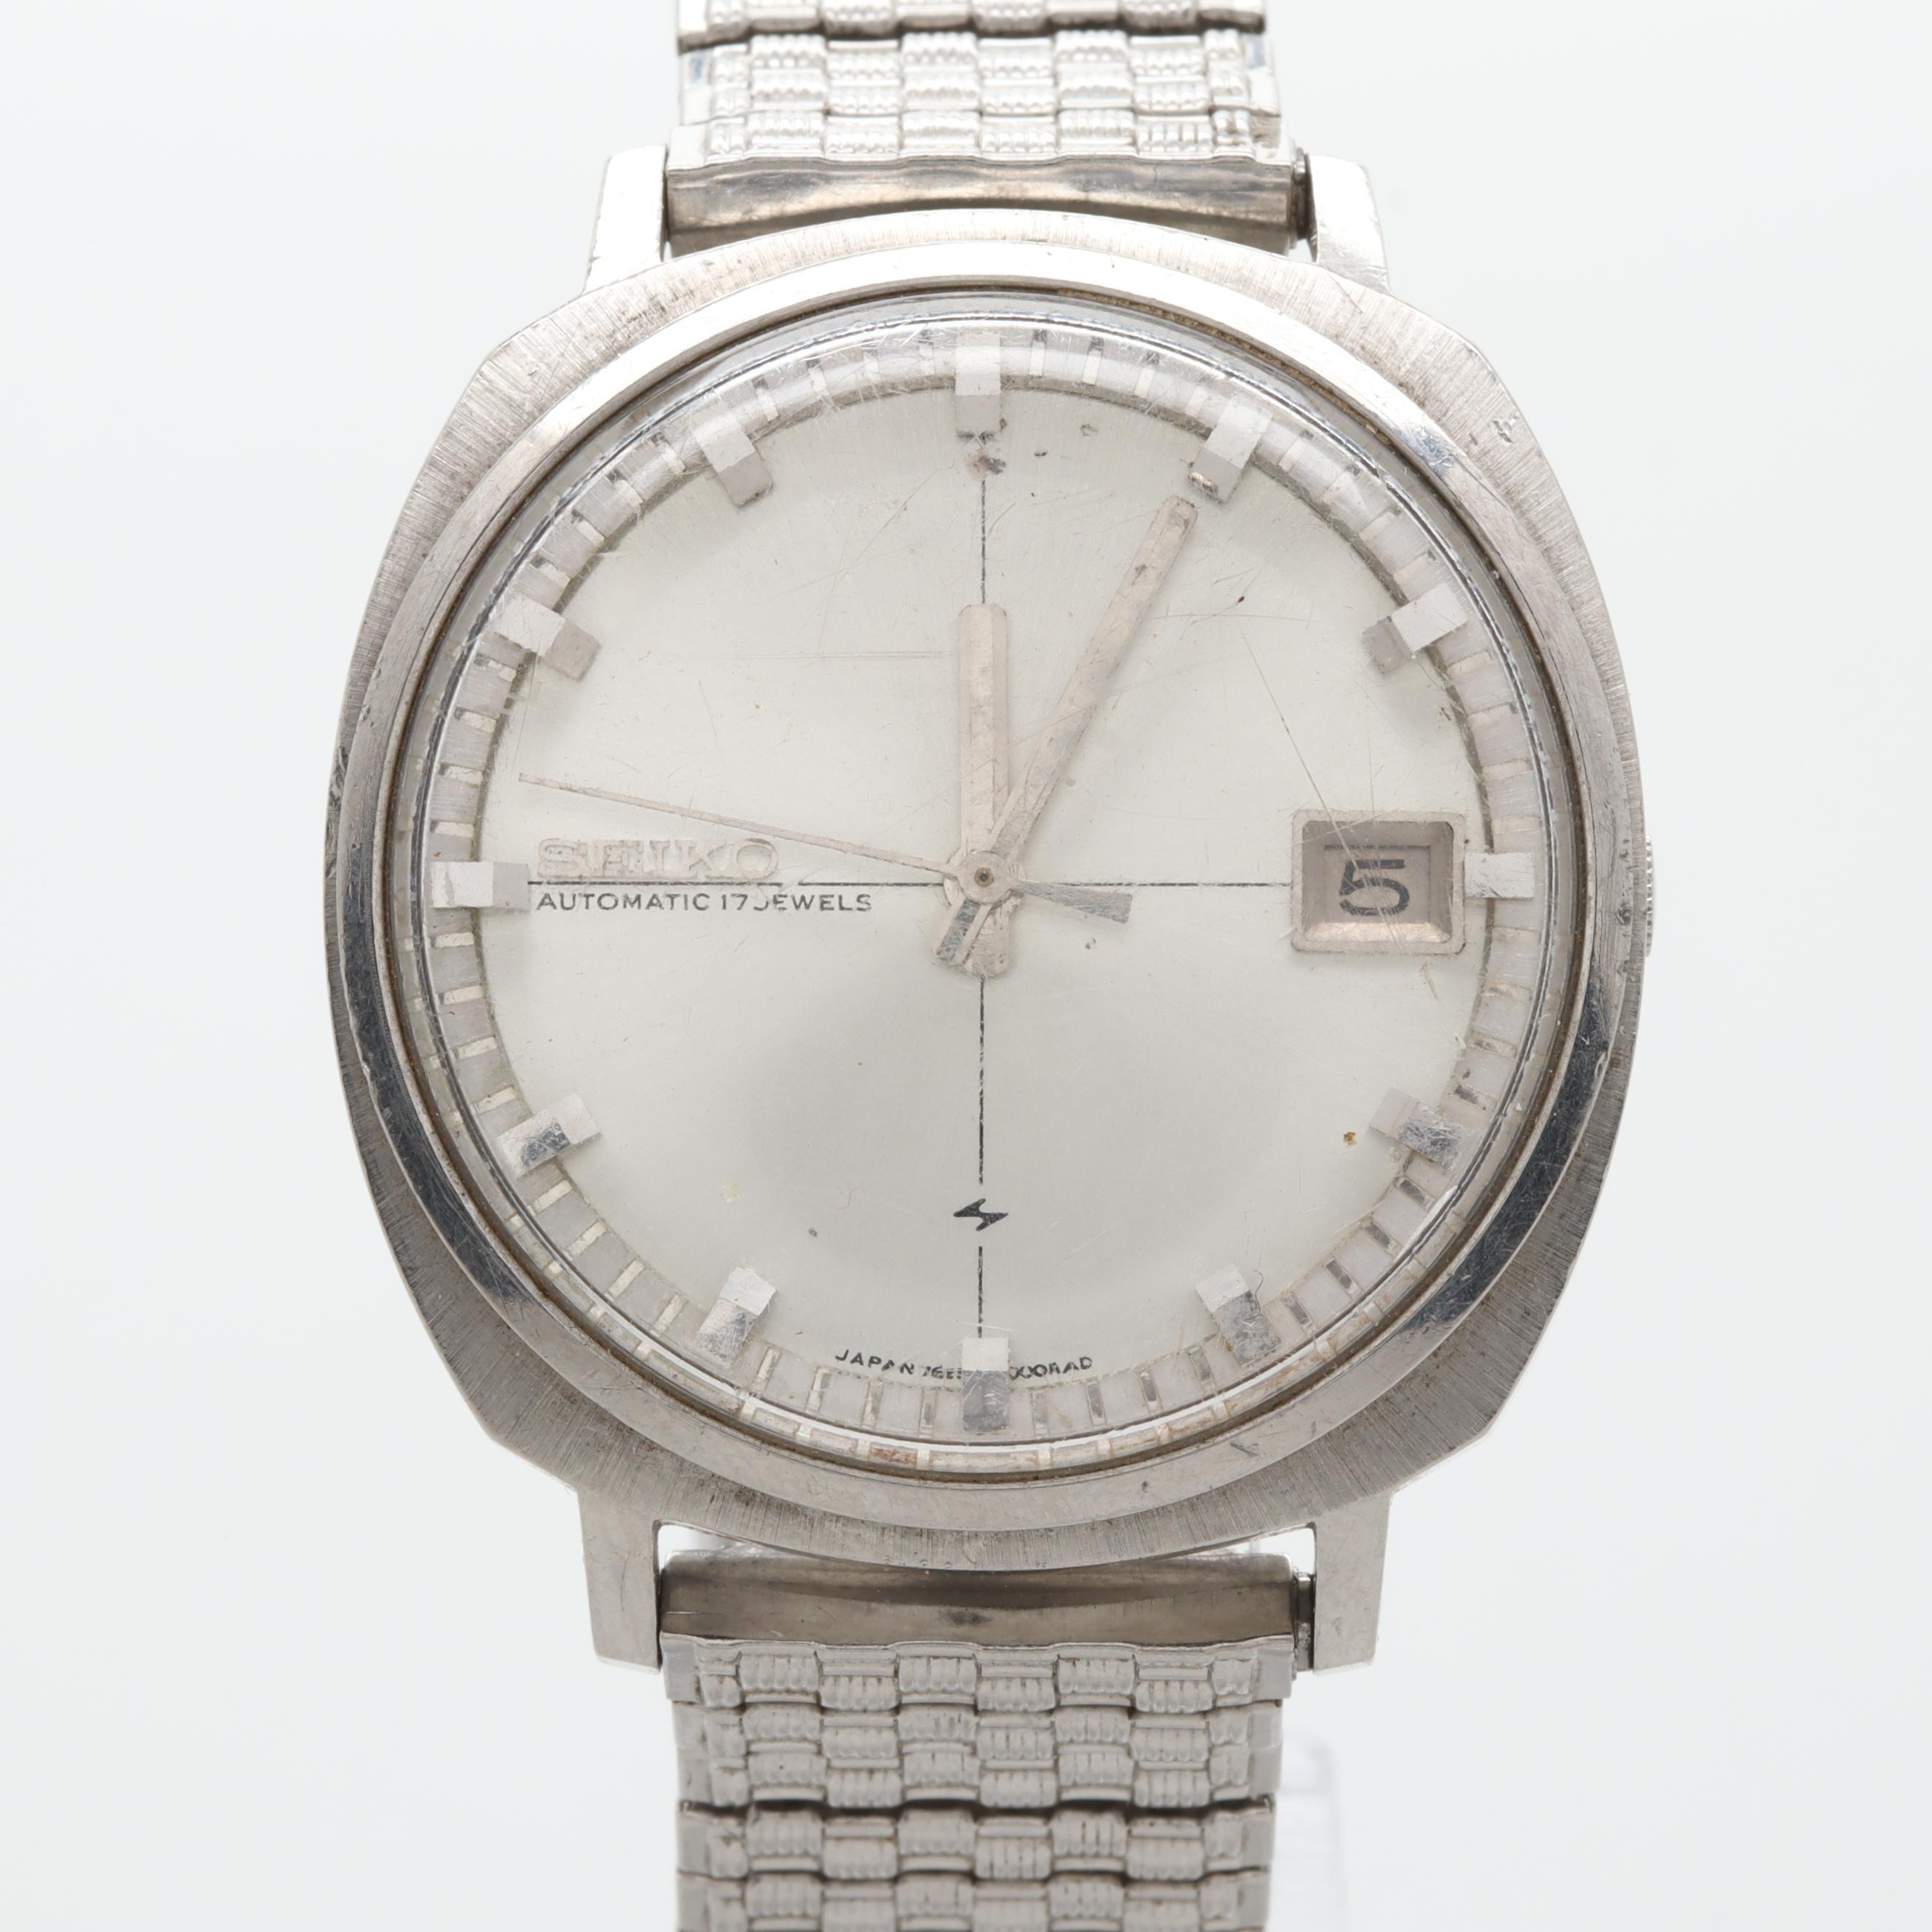 Seiko Automatic Stainless Steel Wristwatch